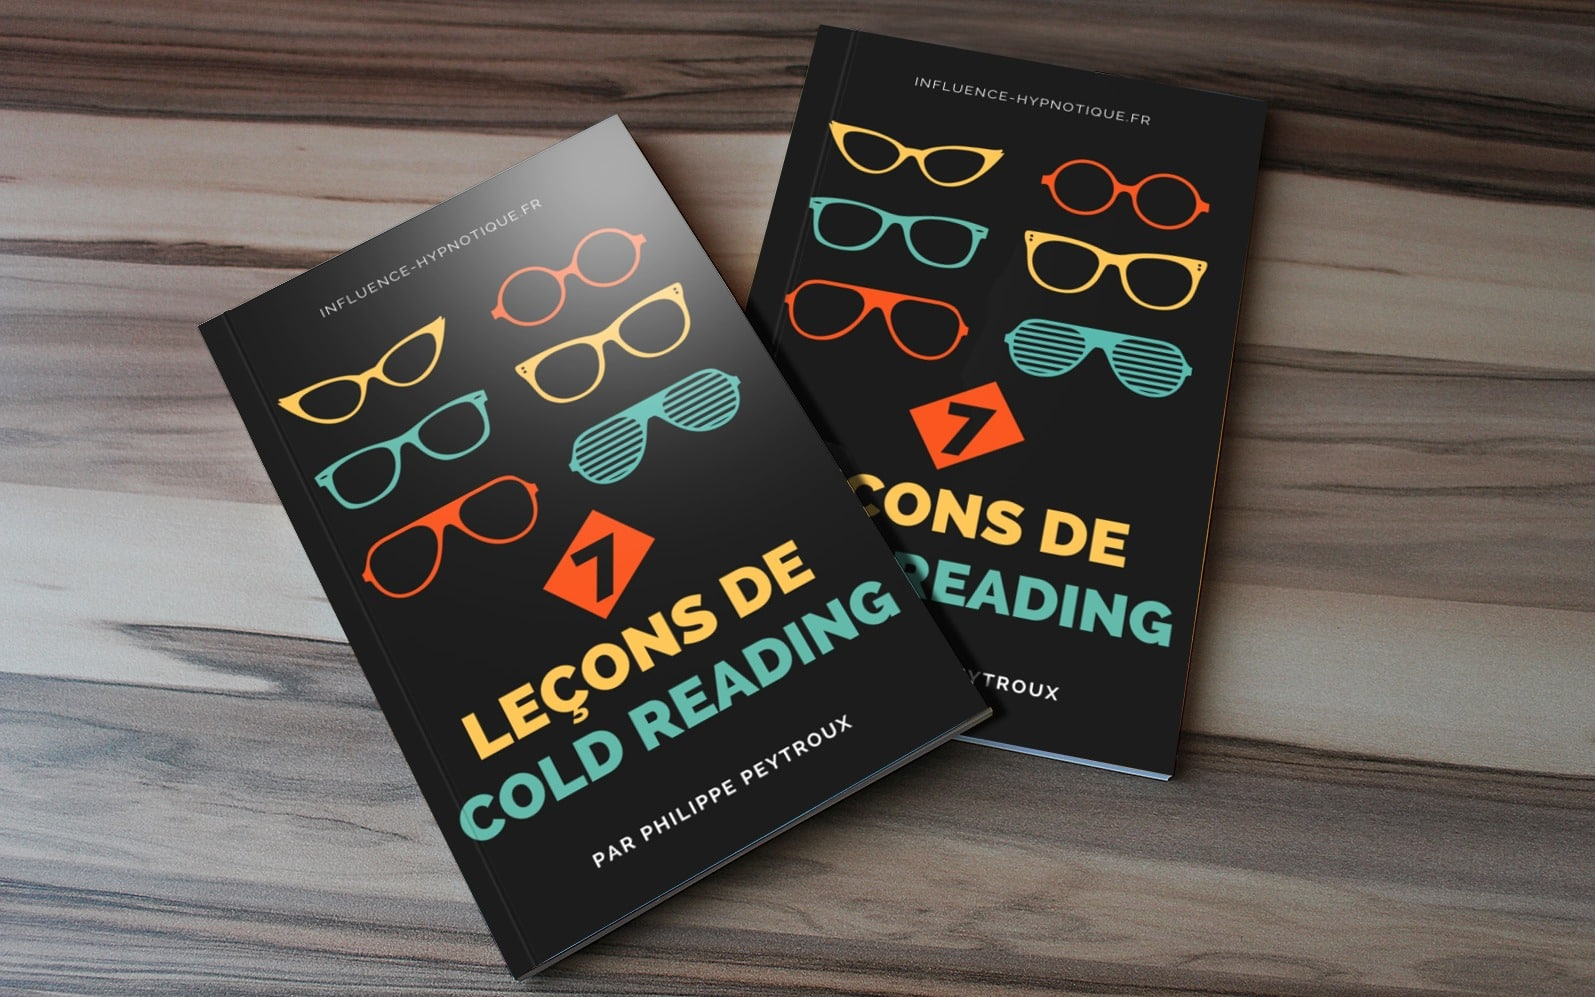 7 leçons de Cold Reading PDF - Cerner les gens